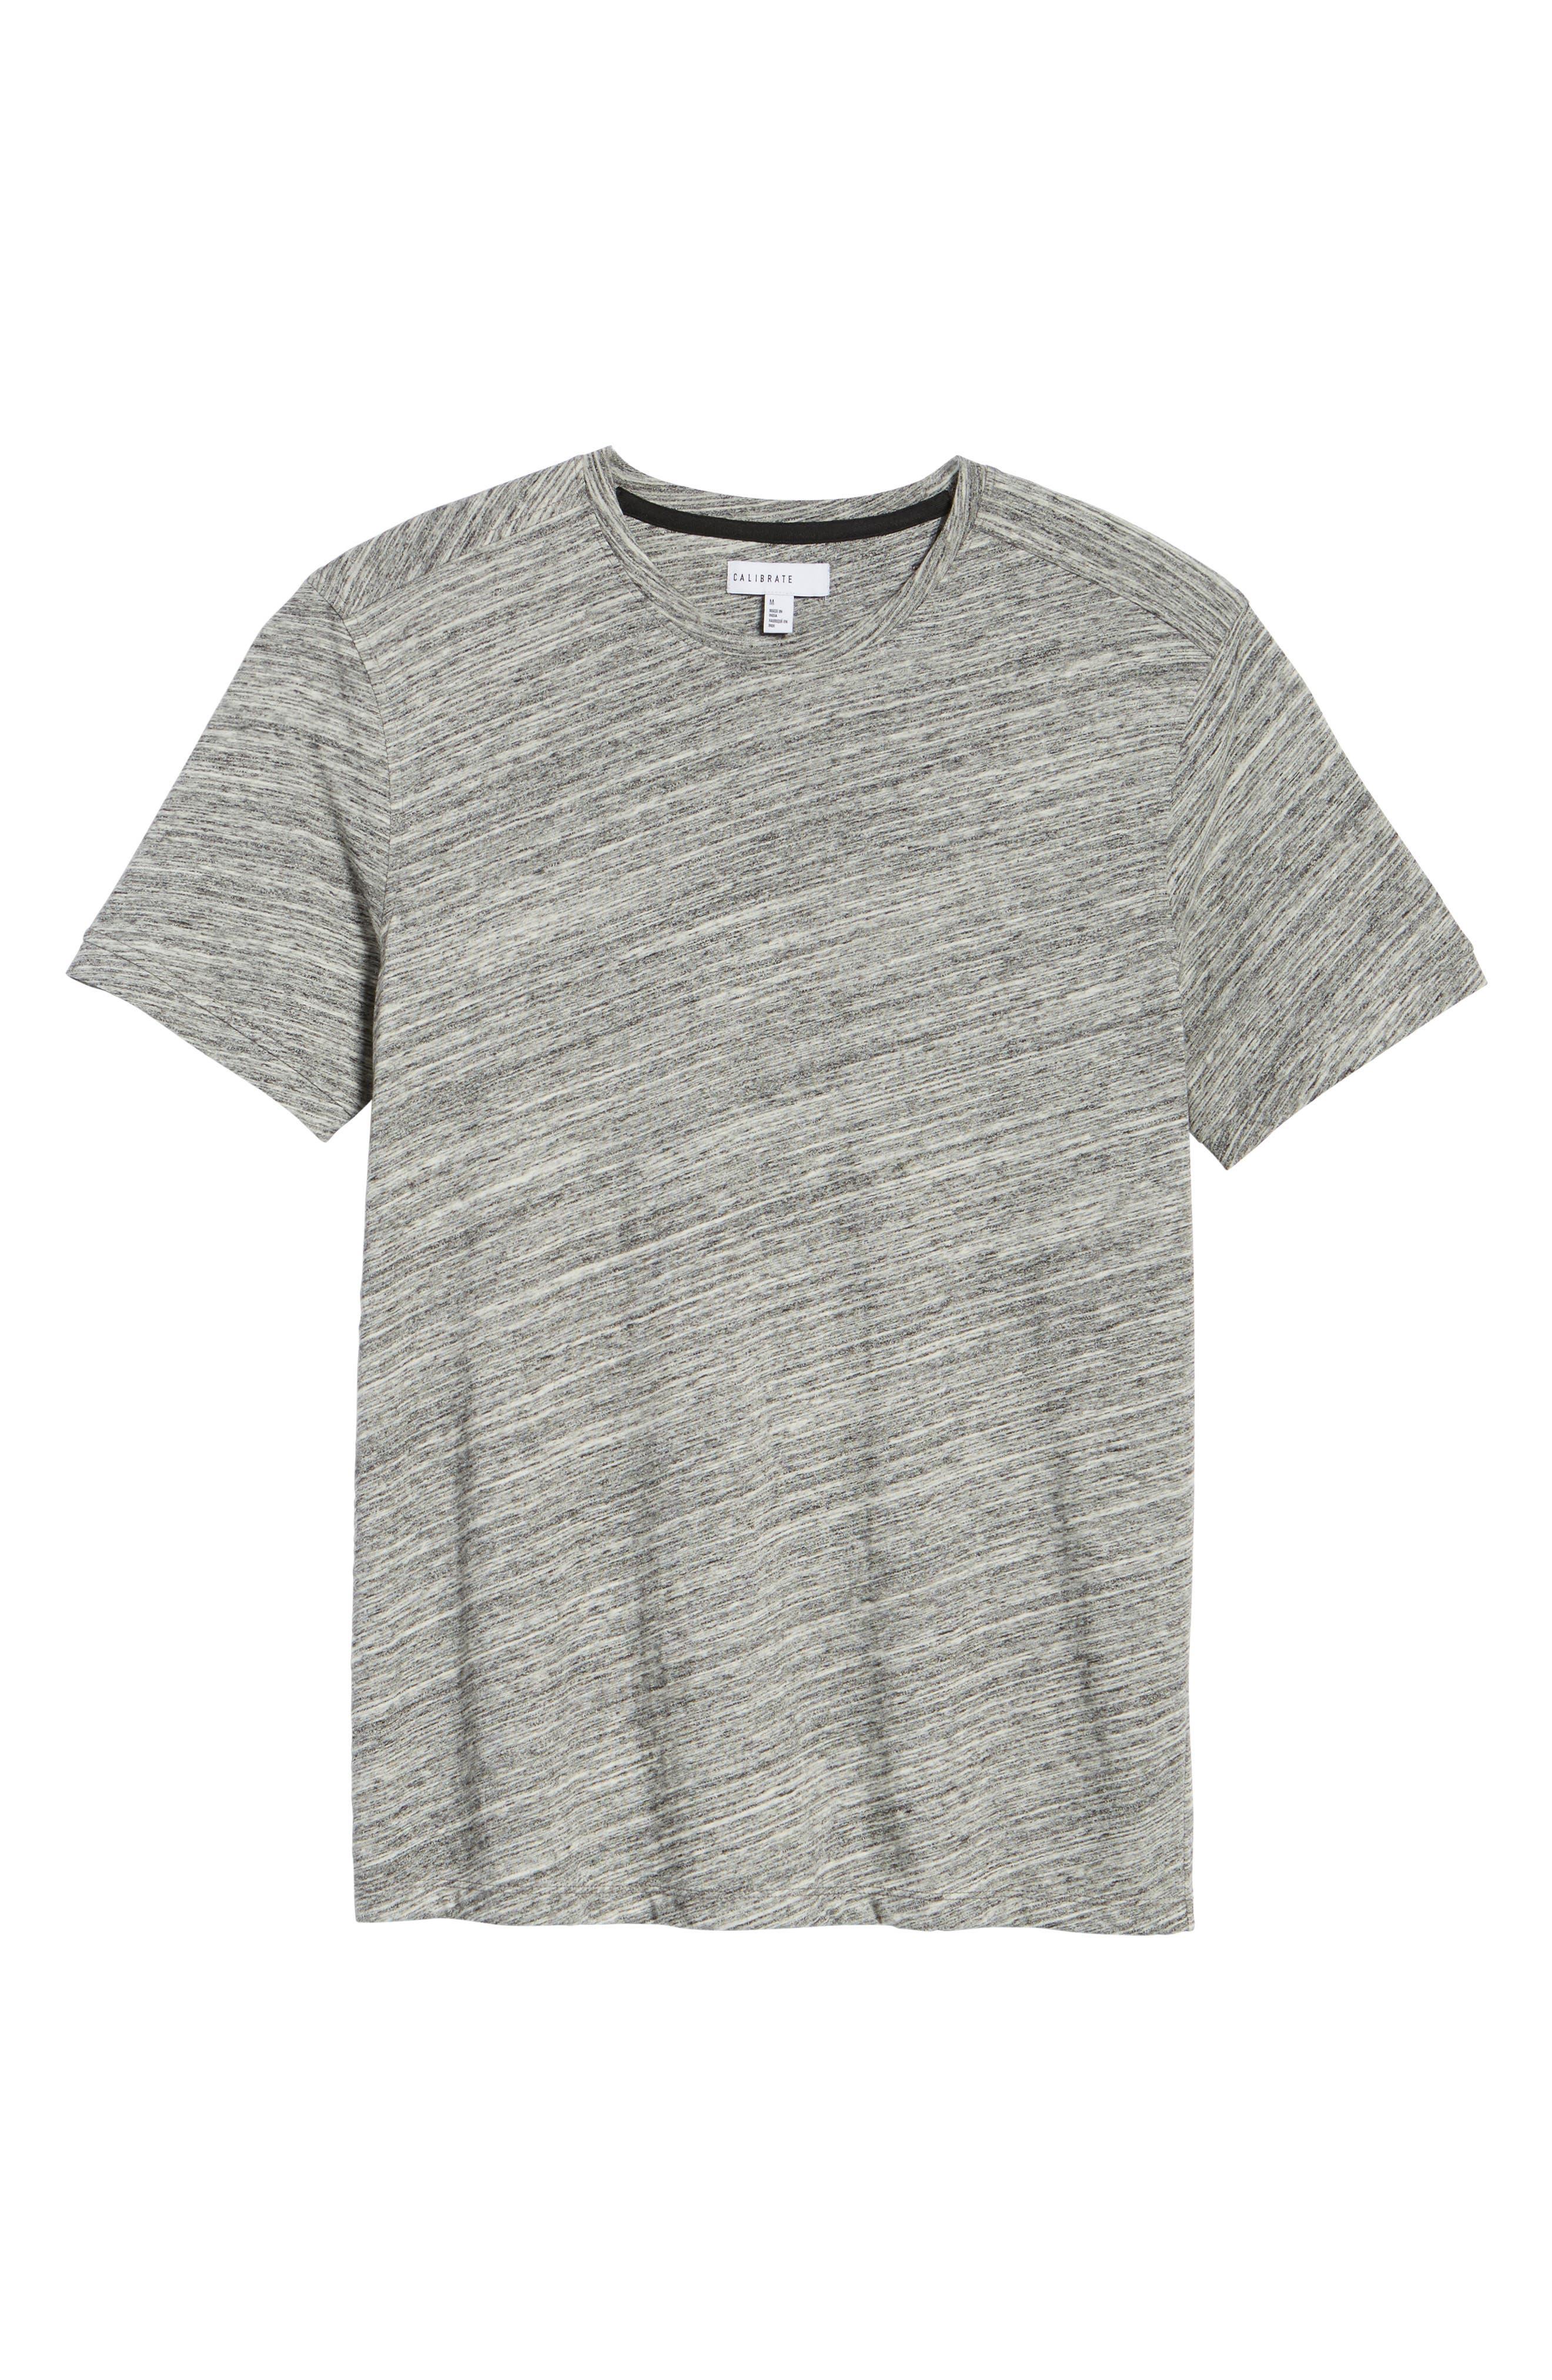 Texture T-Shirt,                             Alternate thumbnail 5, color,                             Ivory Egret Spacedye